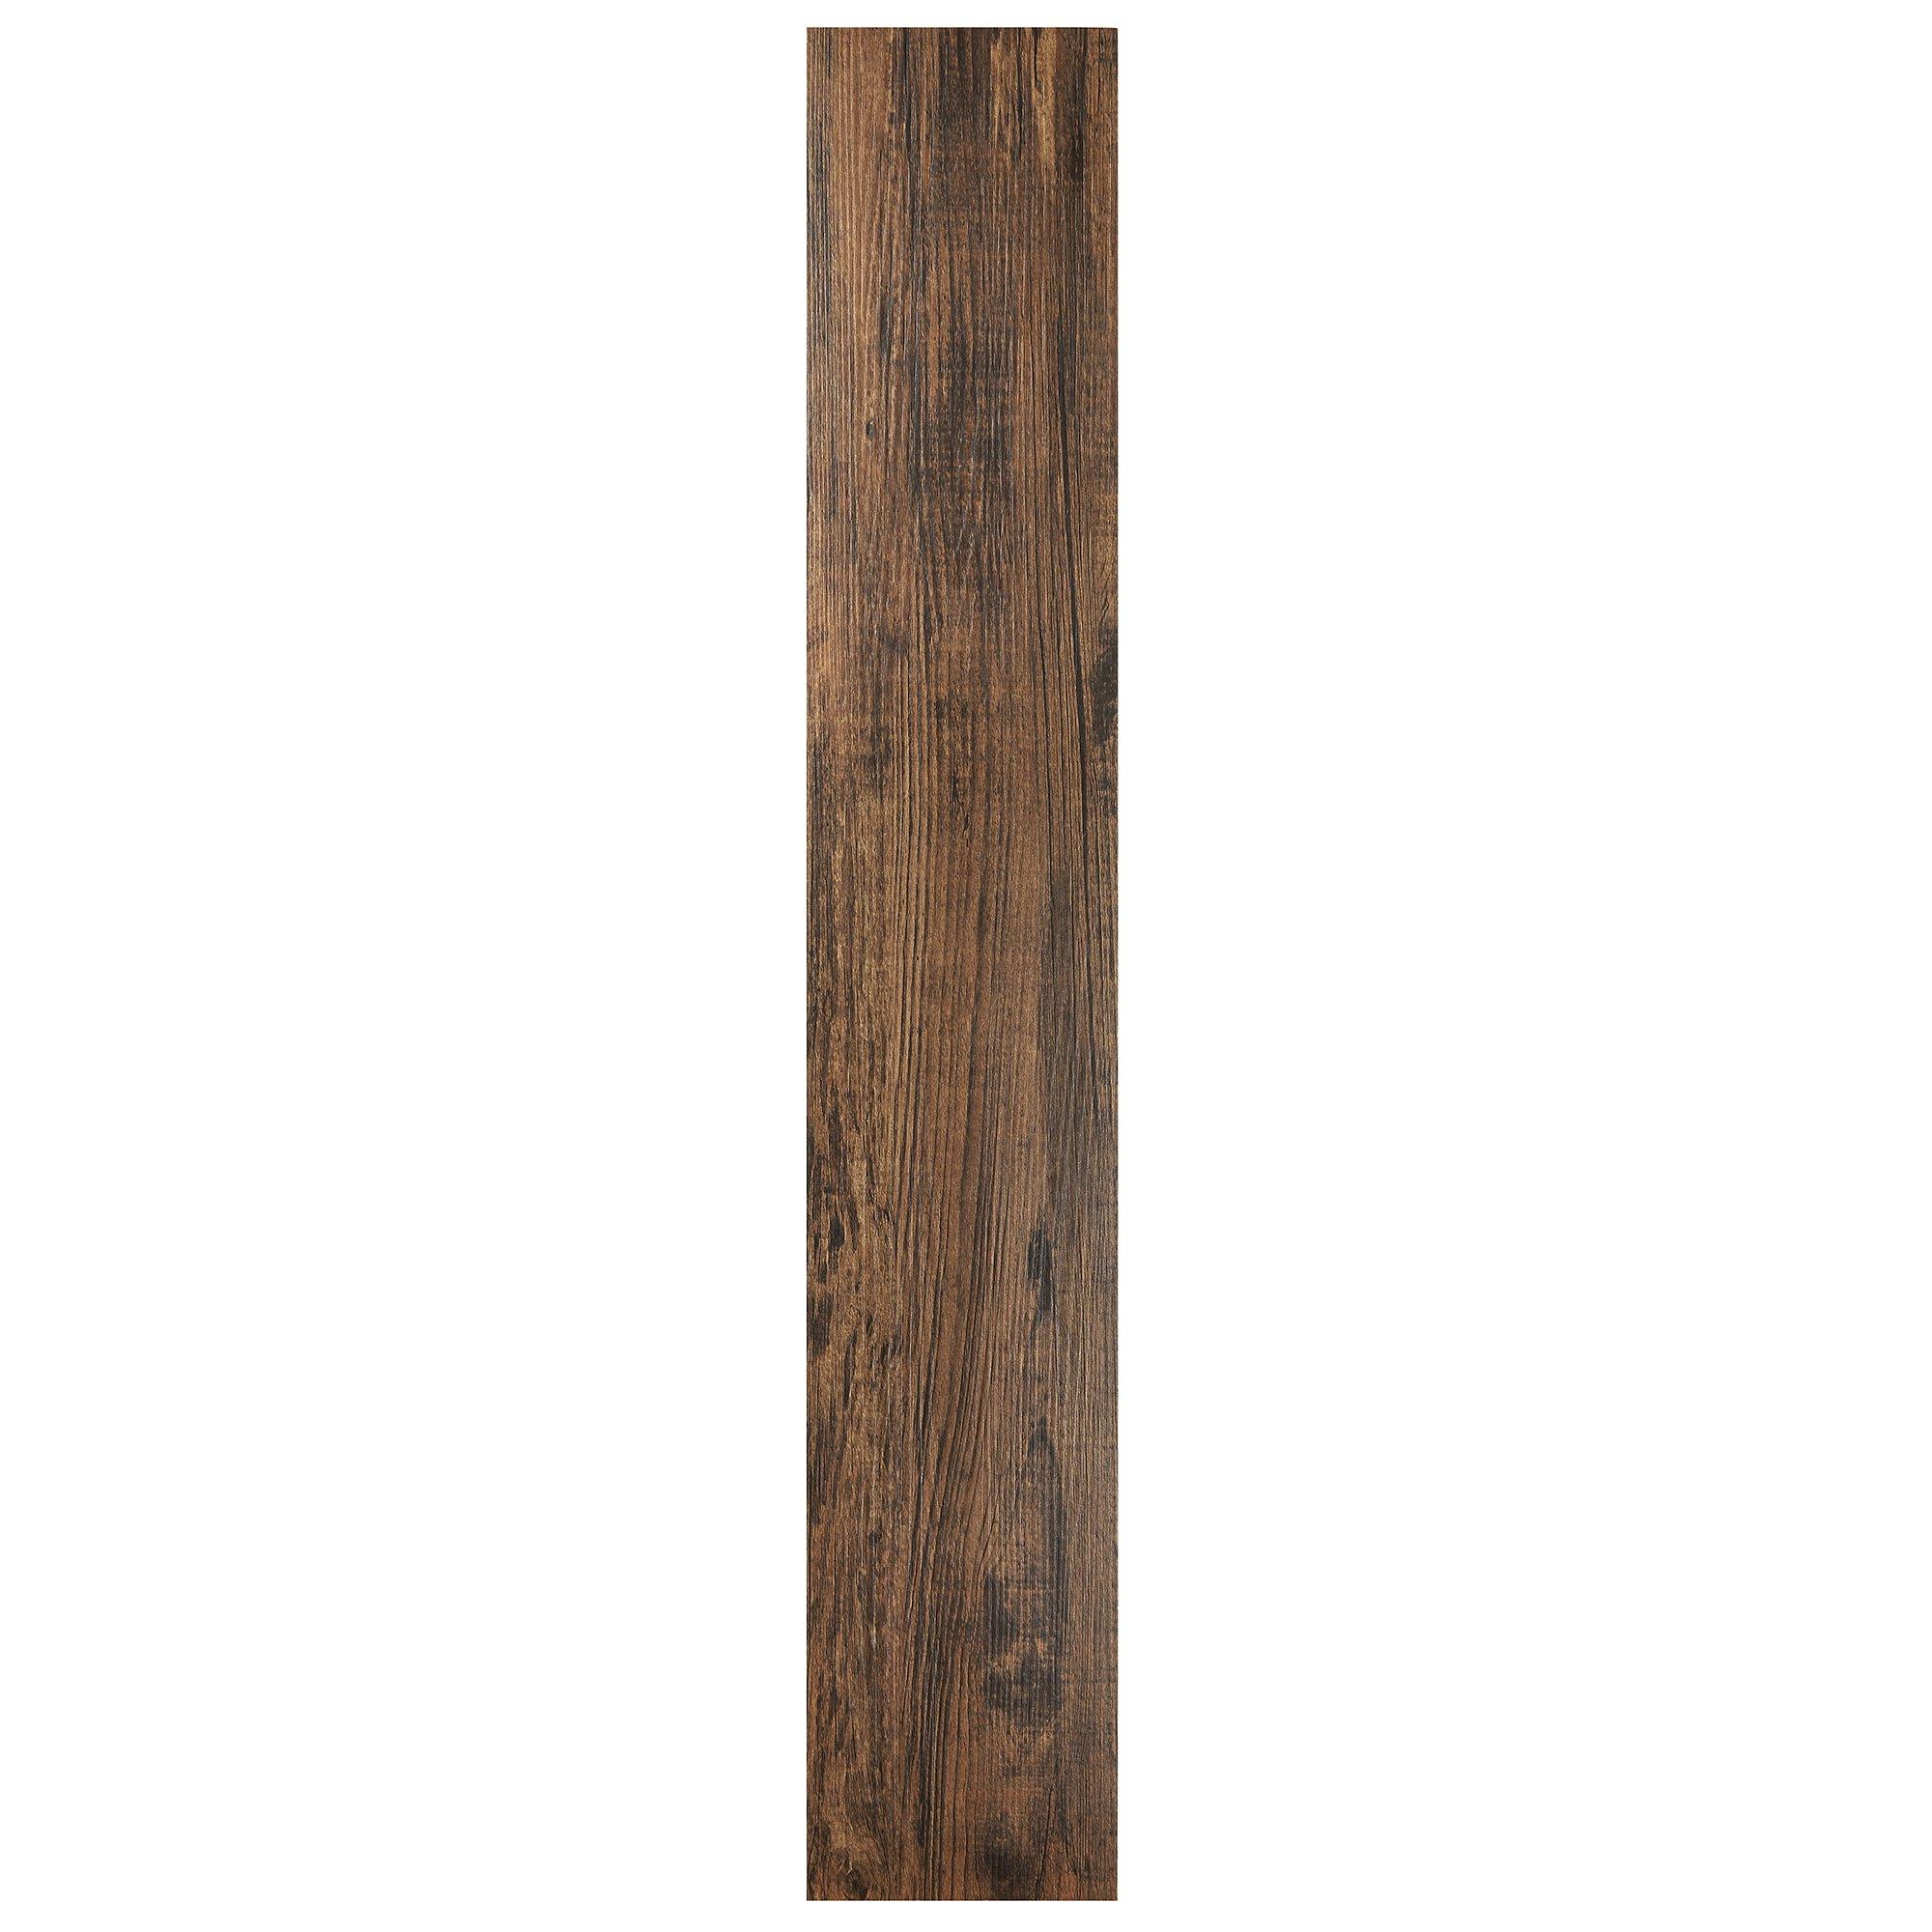 Achim Home Furnishings VFP2.0MH10 Tivoli II Peel 'N' Stick Vinyl Floor Planks (10 Pack), Mahogany, 6'' x 36''